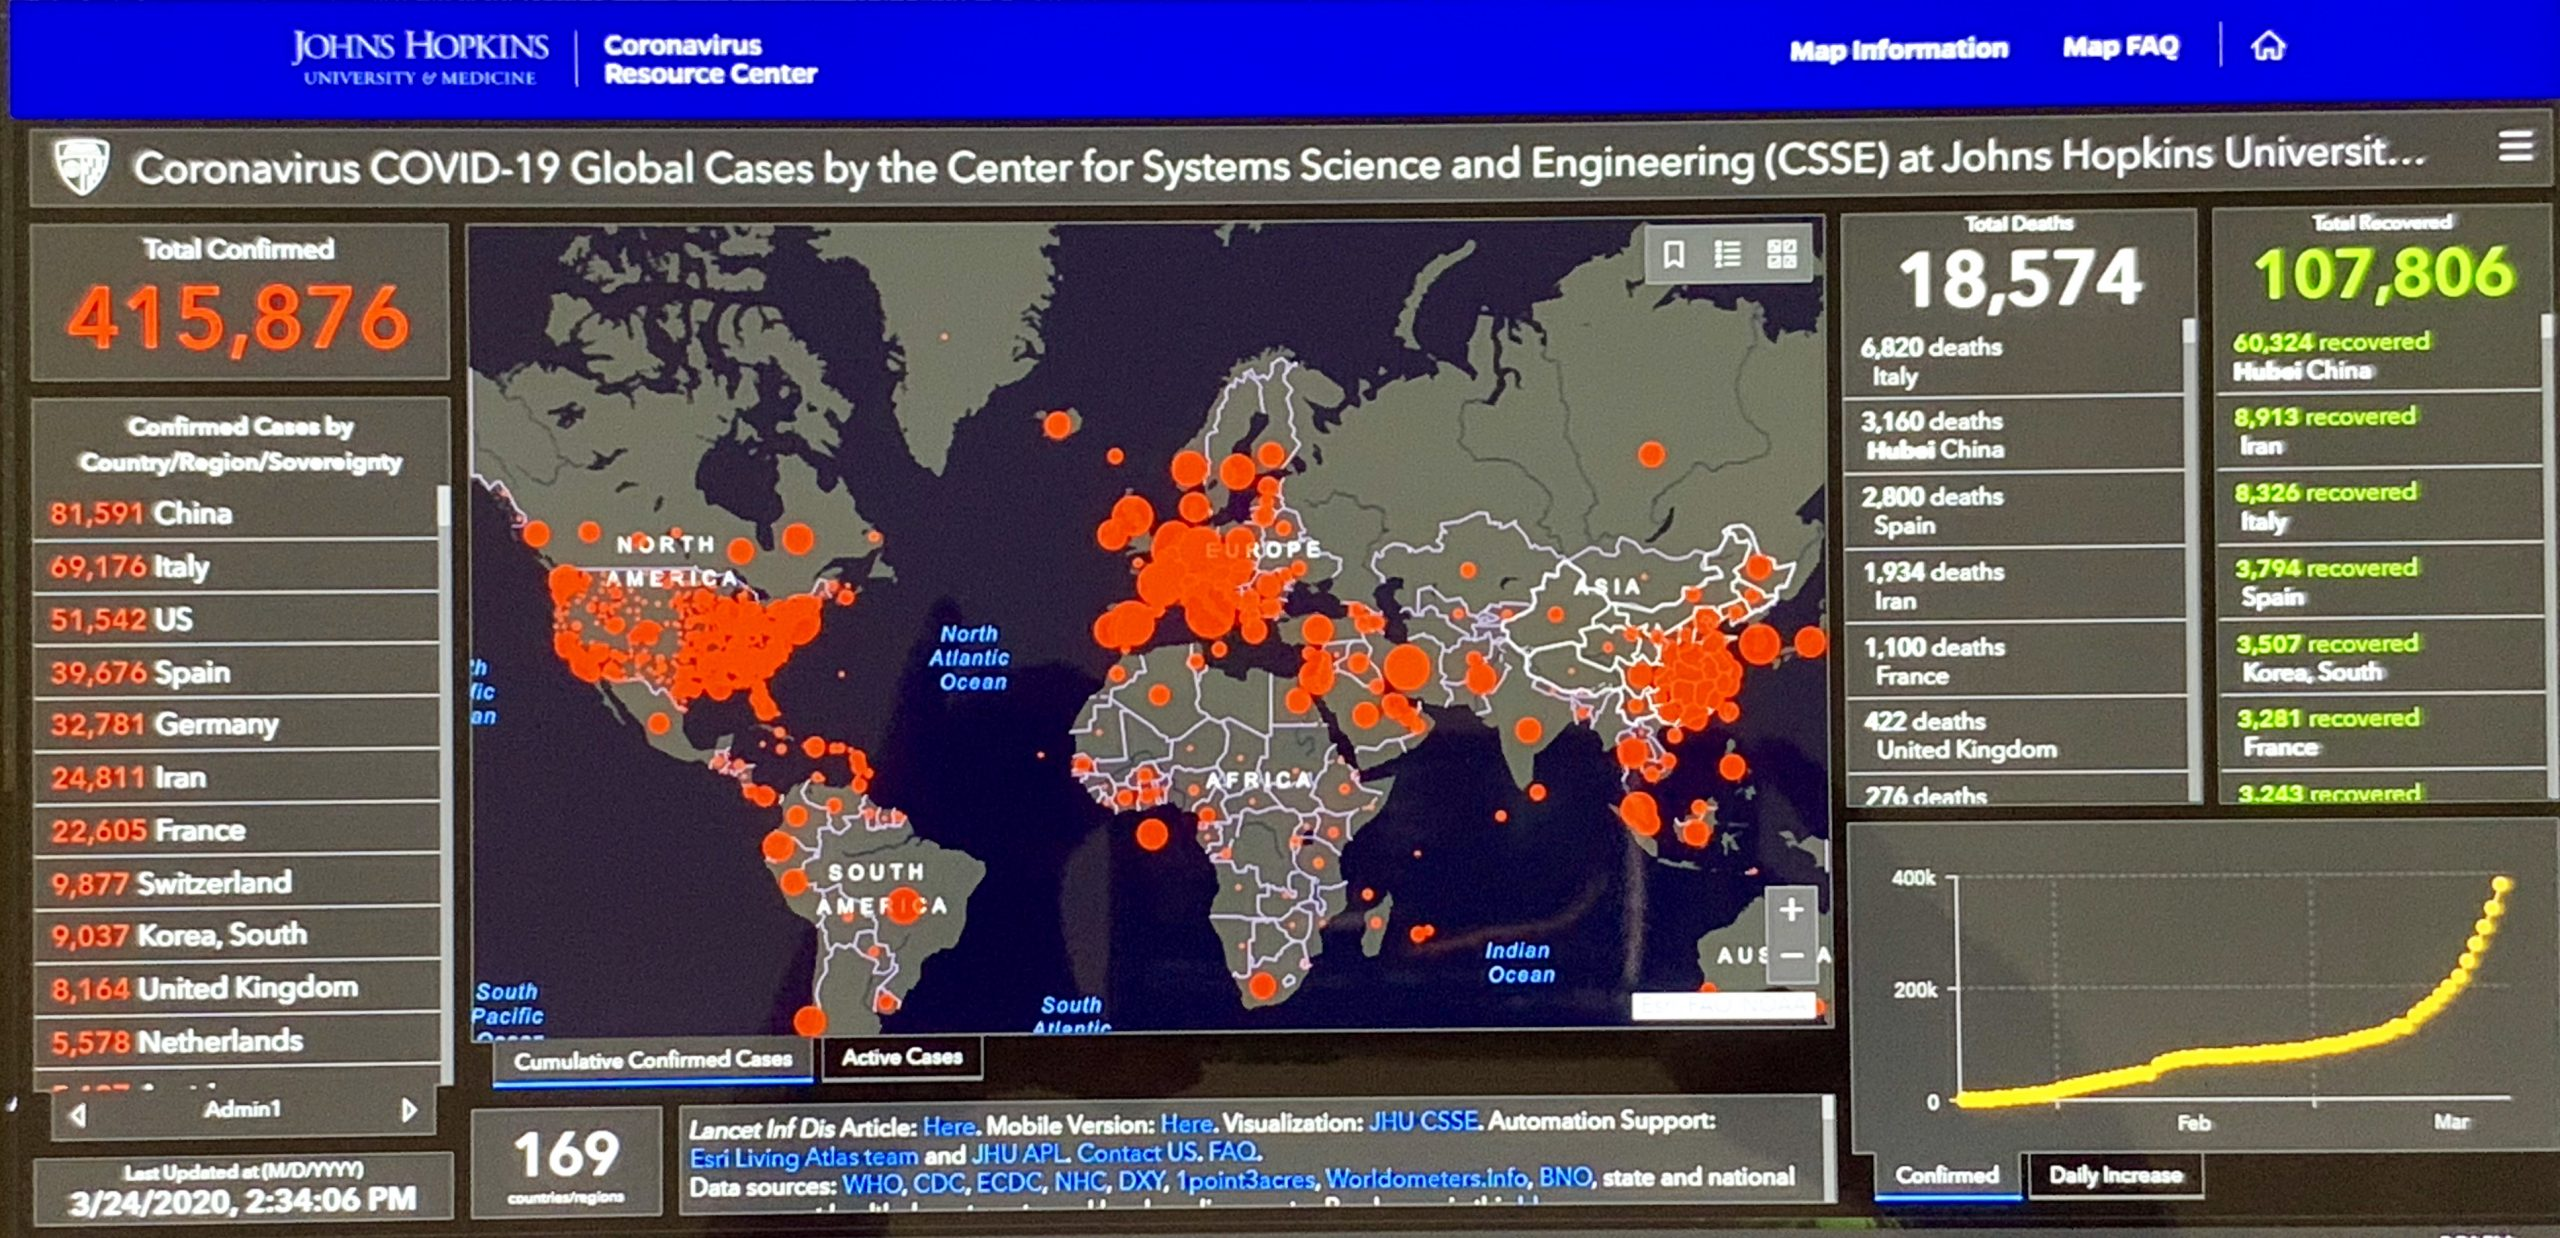 US Coronavirus Cases March 24, 2020